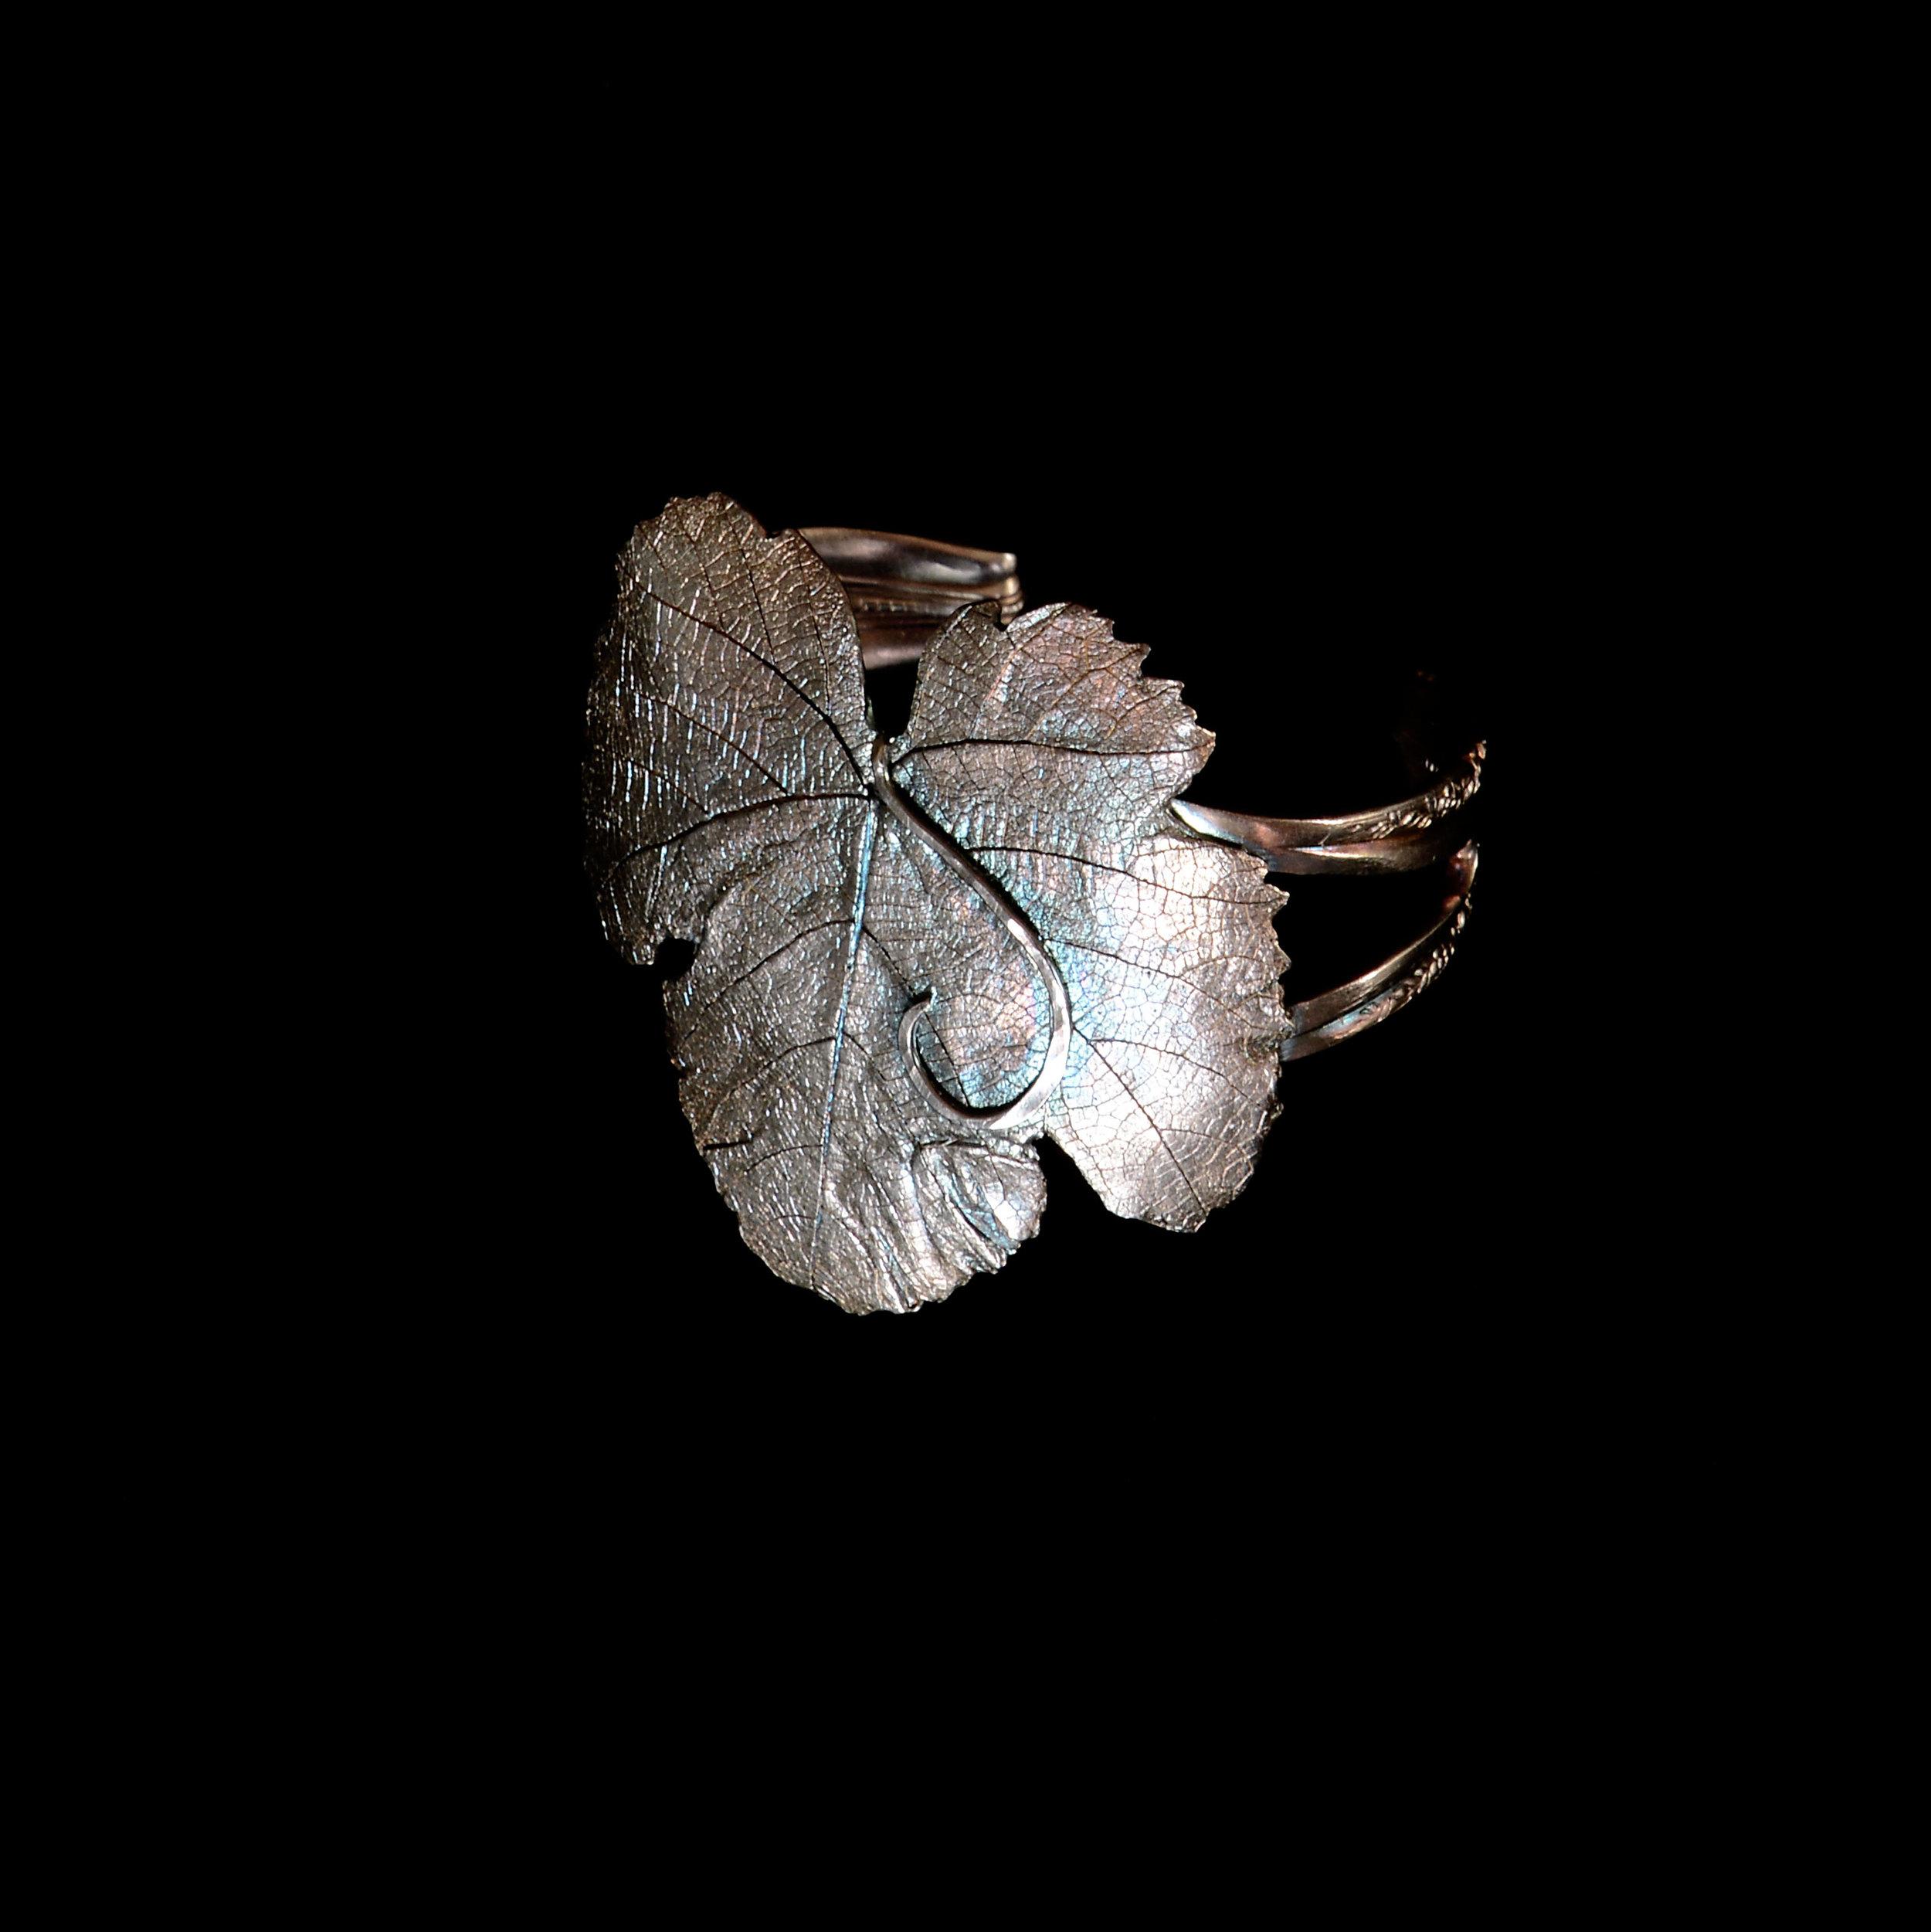 grape-leaf-cuff-bracelet-michelle-hoting-web.jpg